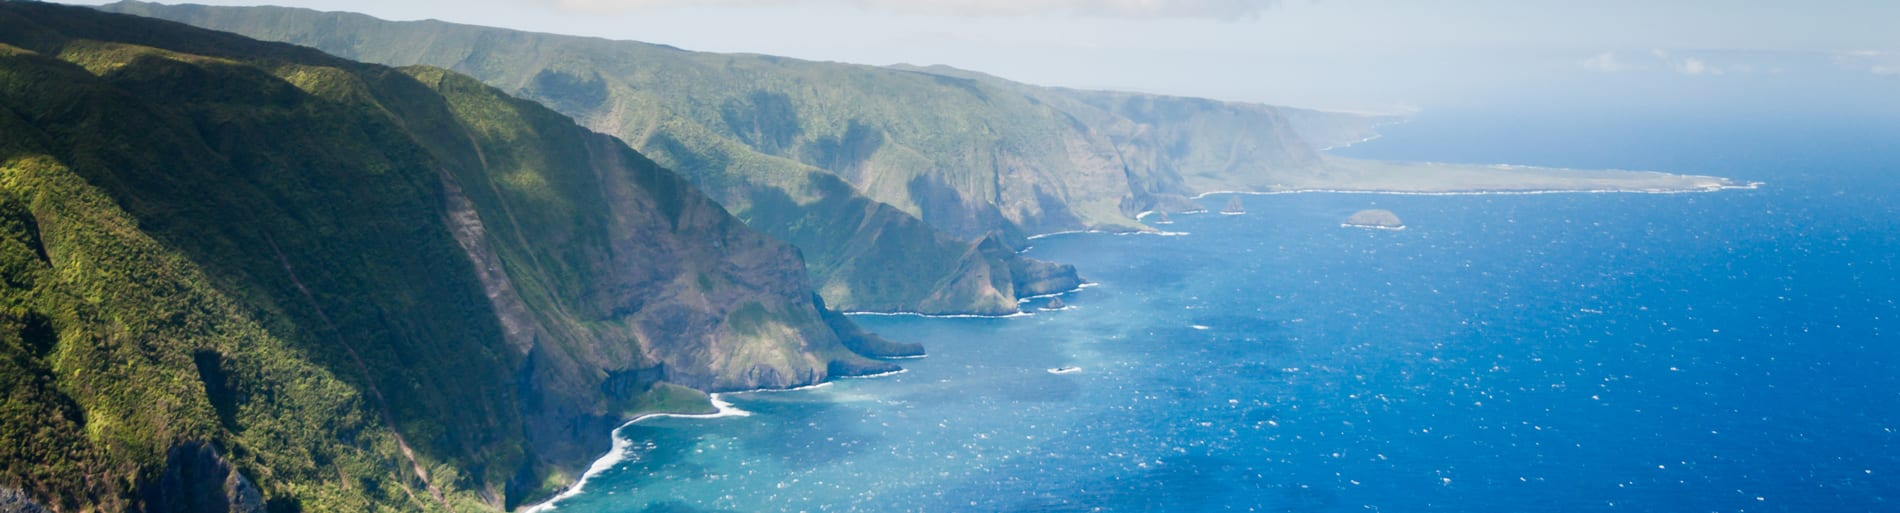 Maui Circle Island tours - 2346